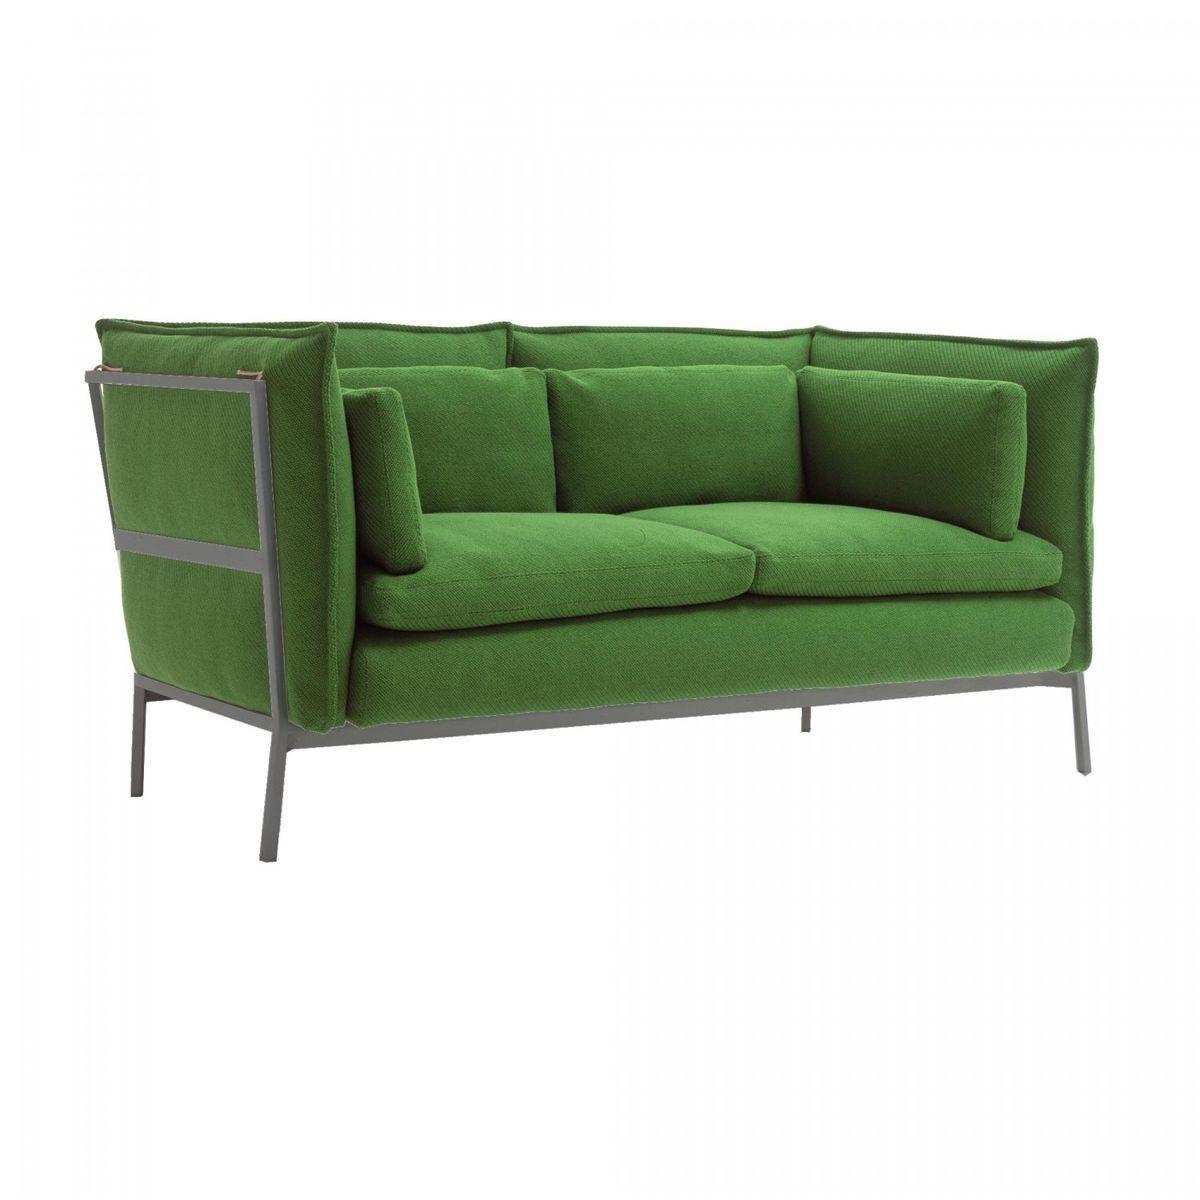 Basket bouroullec 2 sitzer sofa cappellini for Ohrensessel 1 5 sitzer bezug baumwollmischgewebe